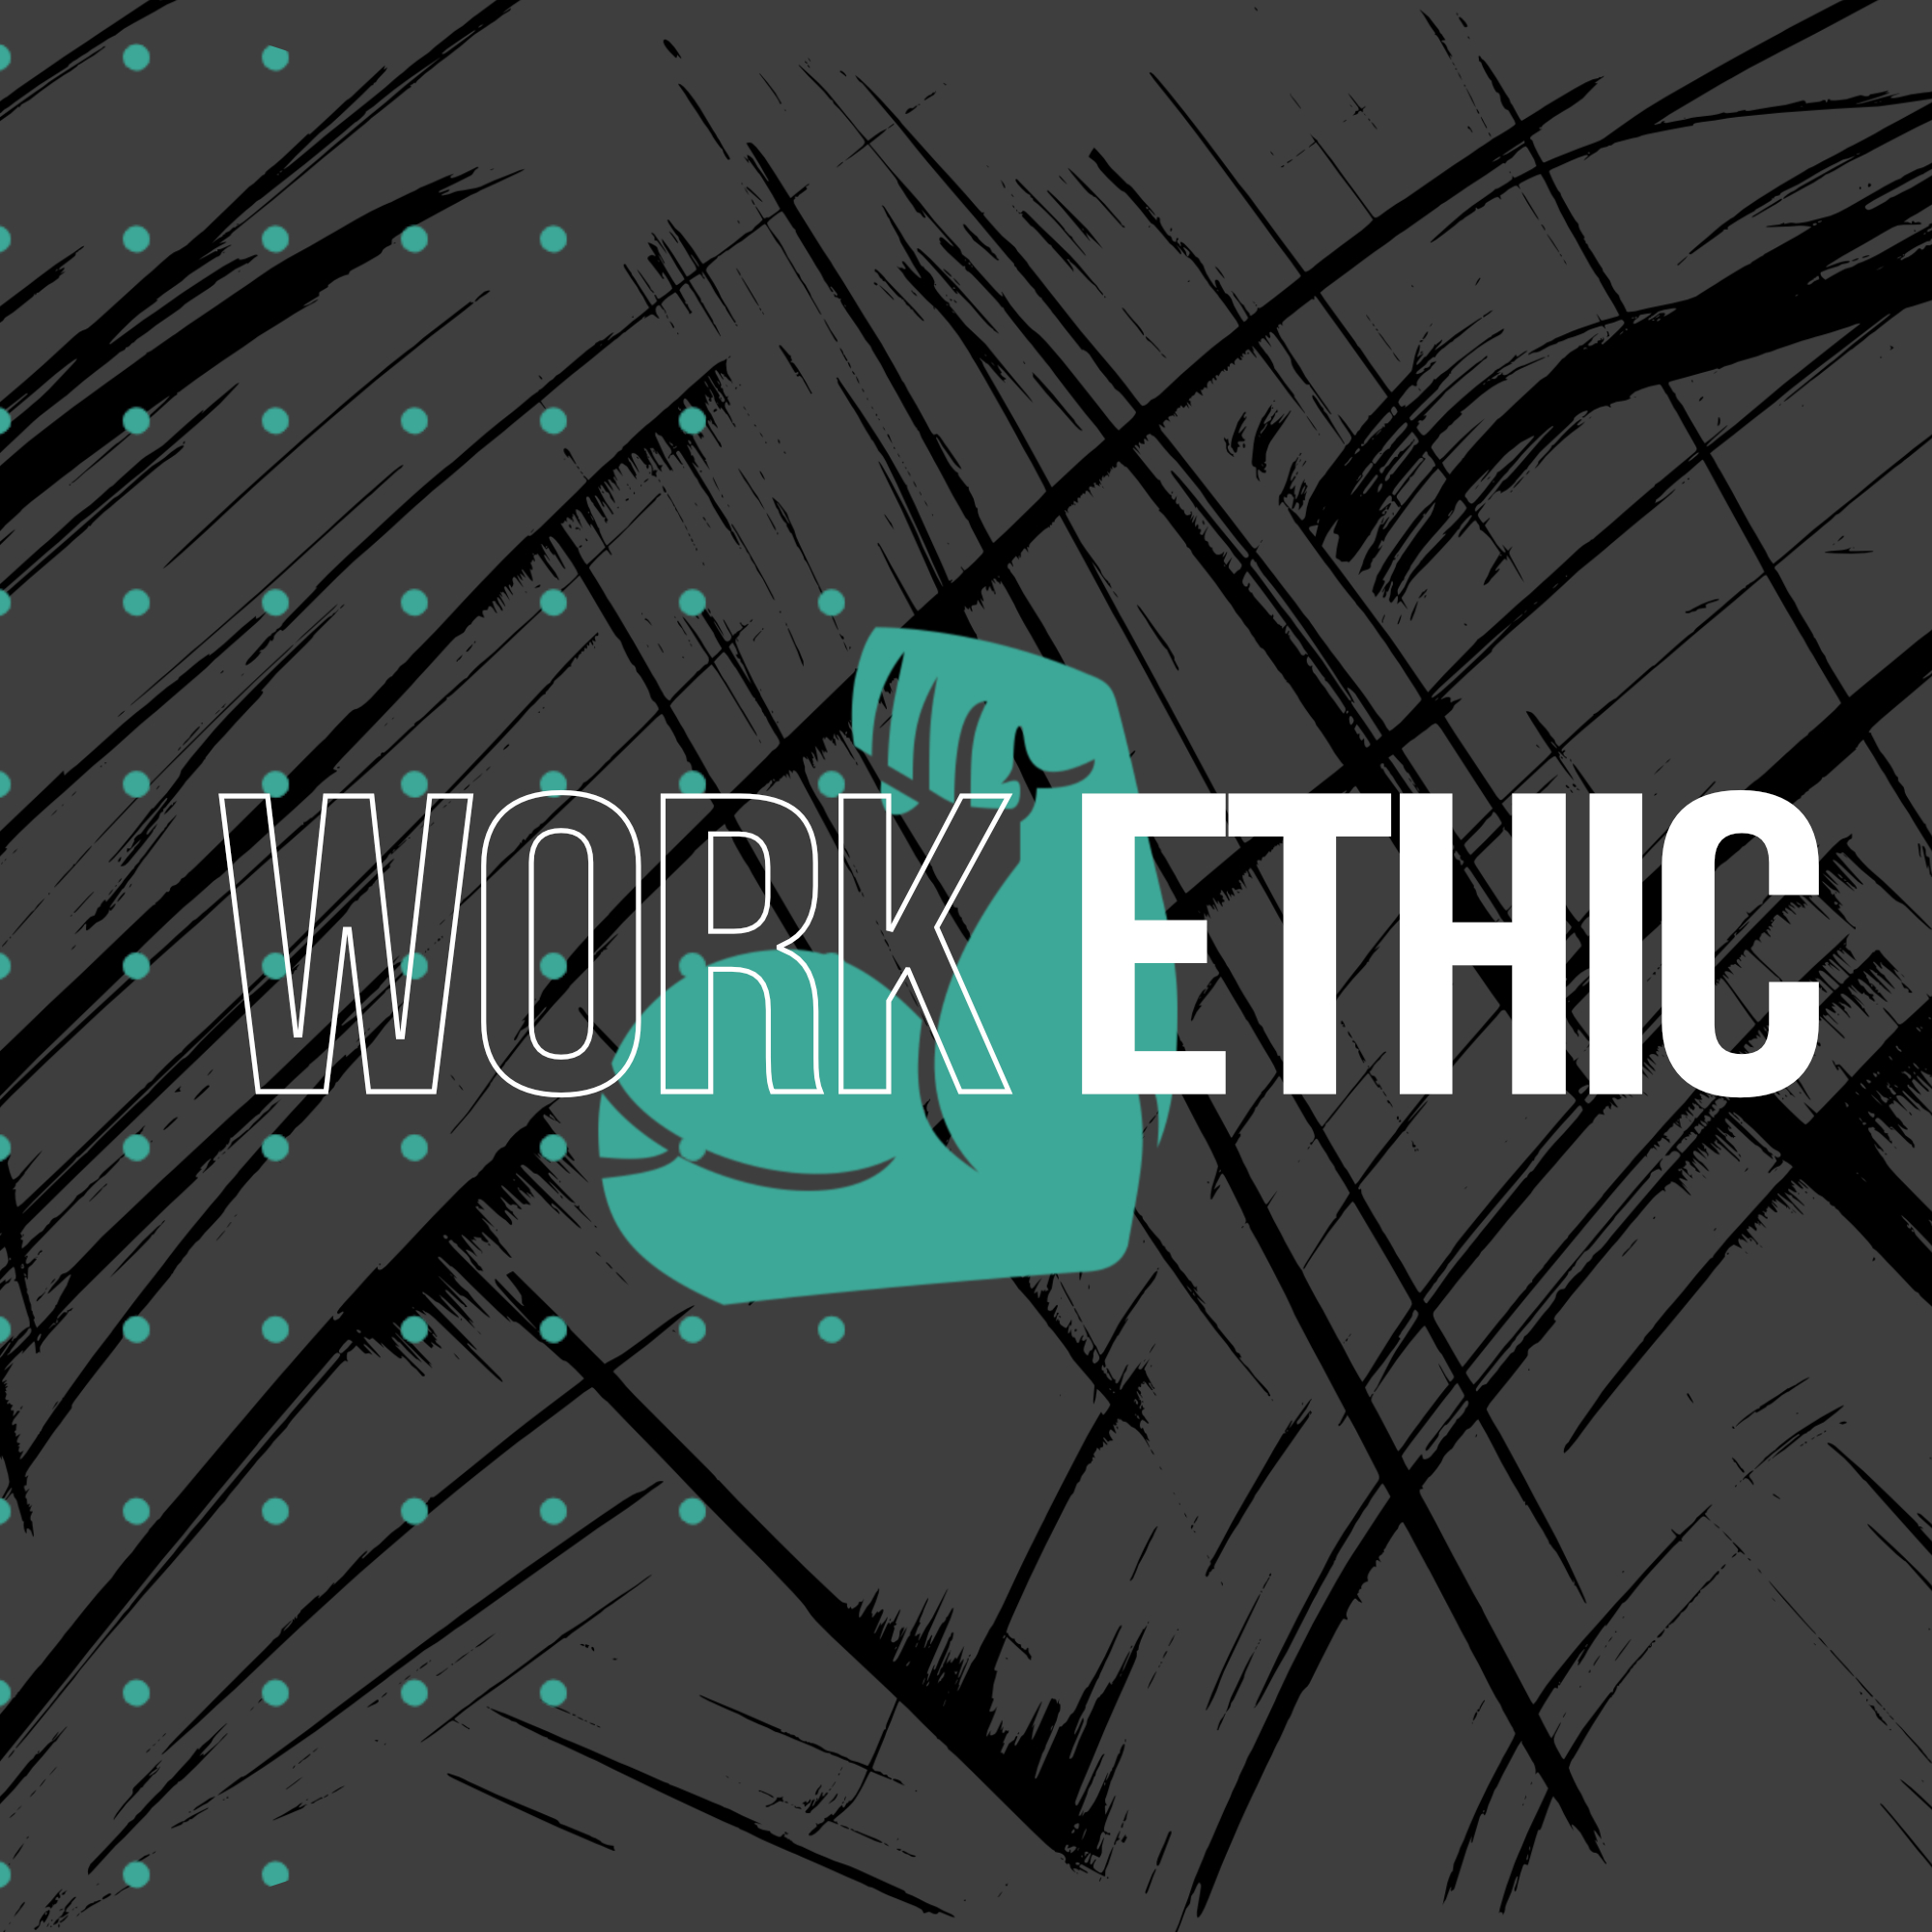 11 Work ethic square.jpg